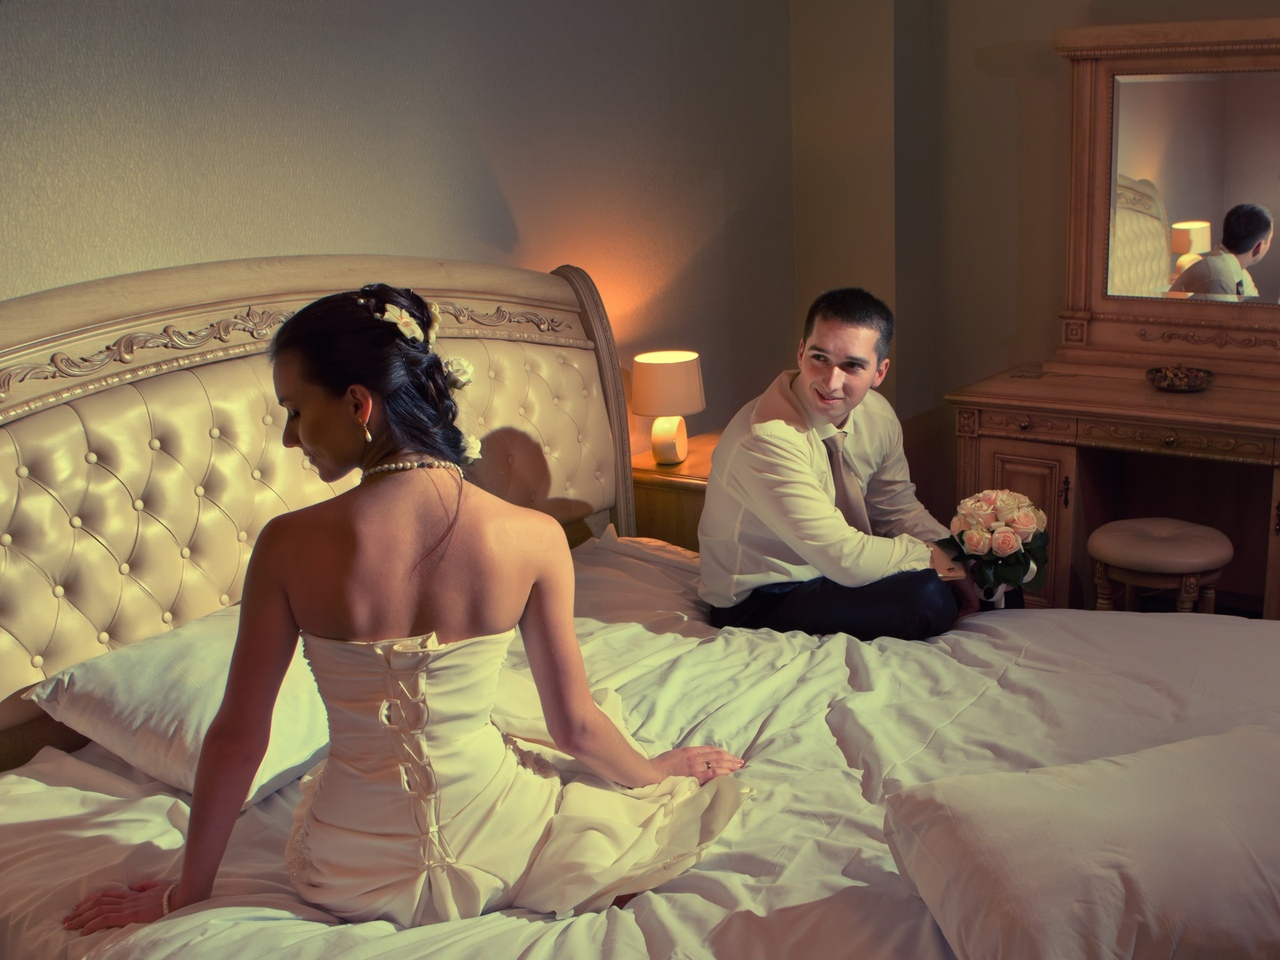 Images of sex wedding night, horny mature girl